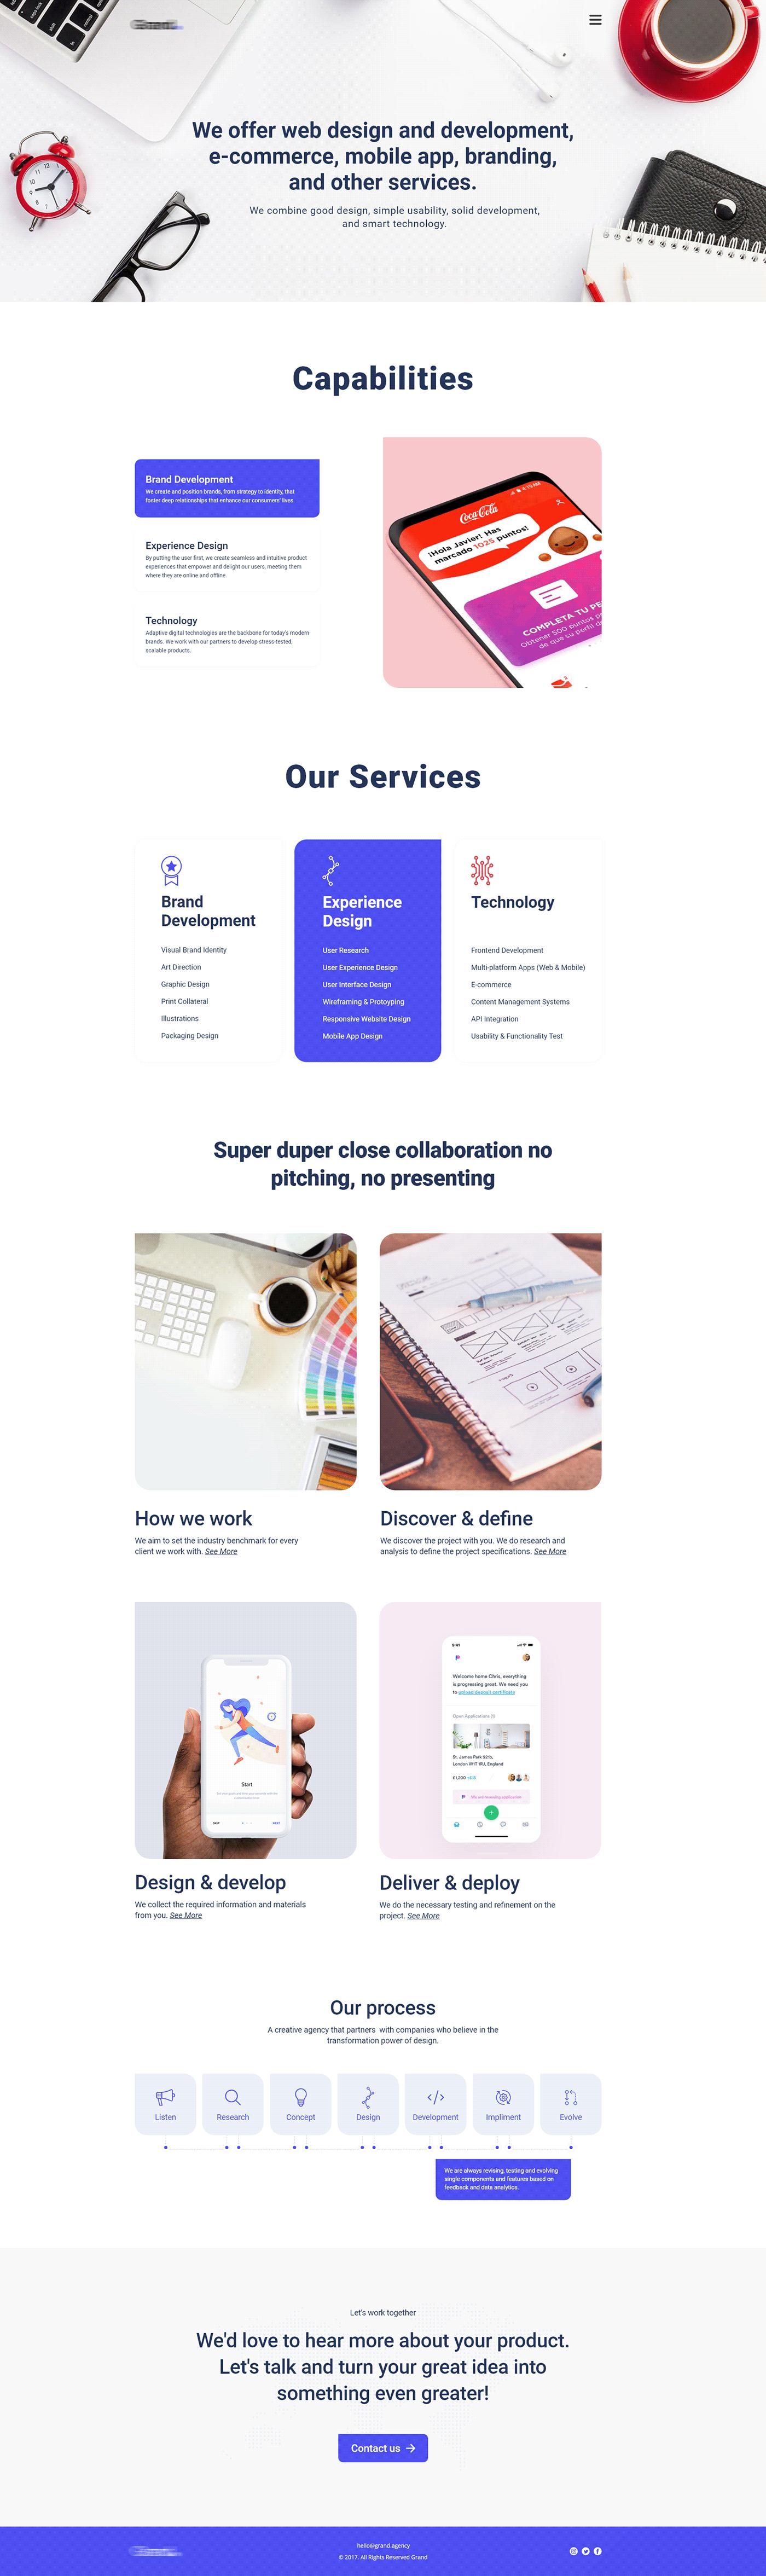 Image may contain: template, screenshot and print